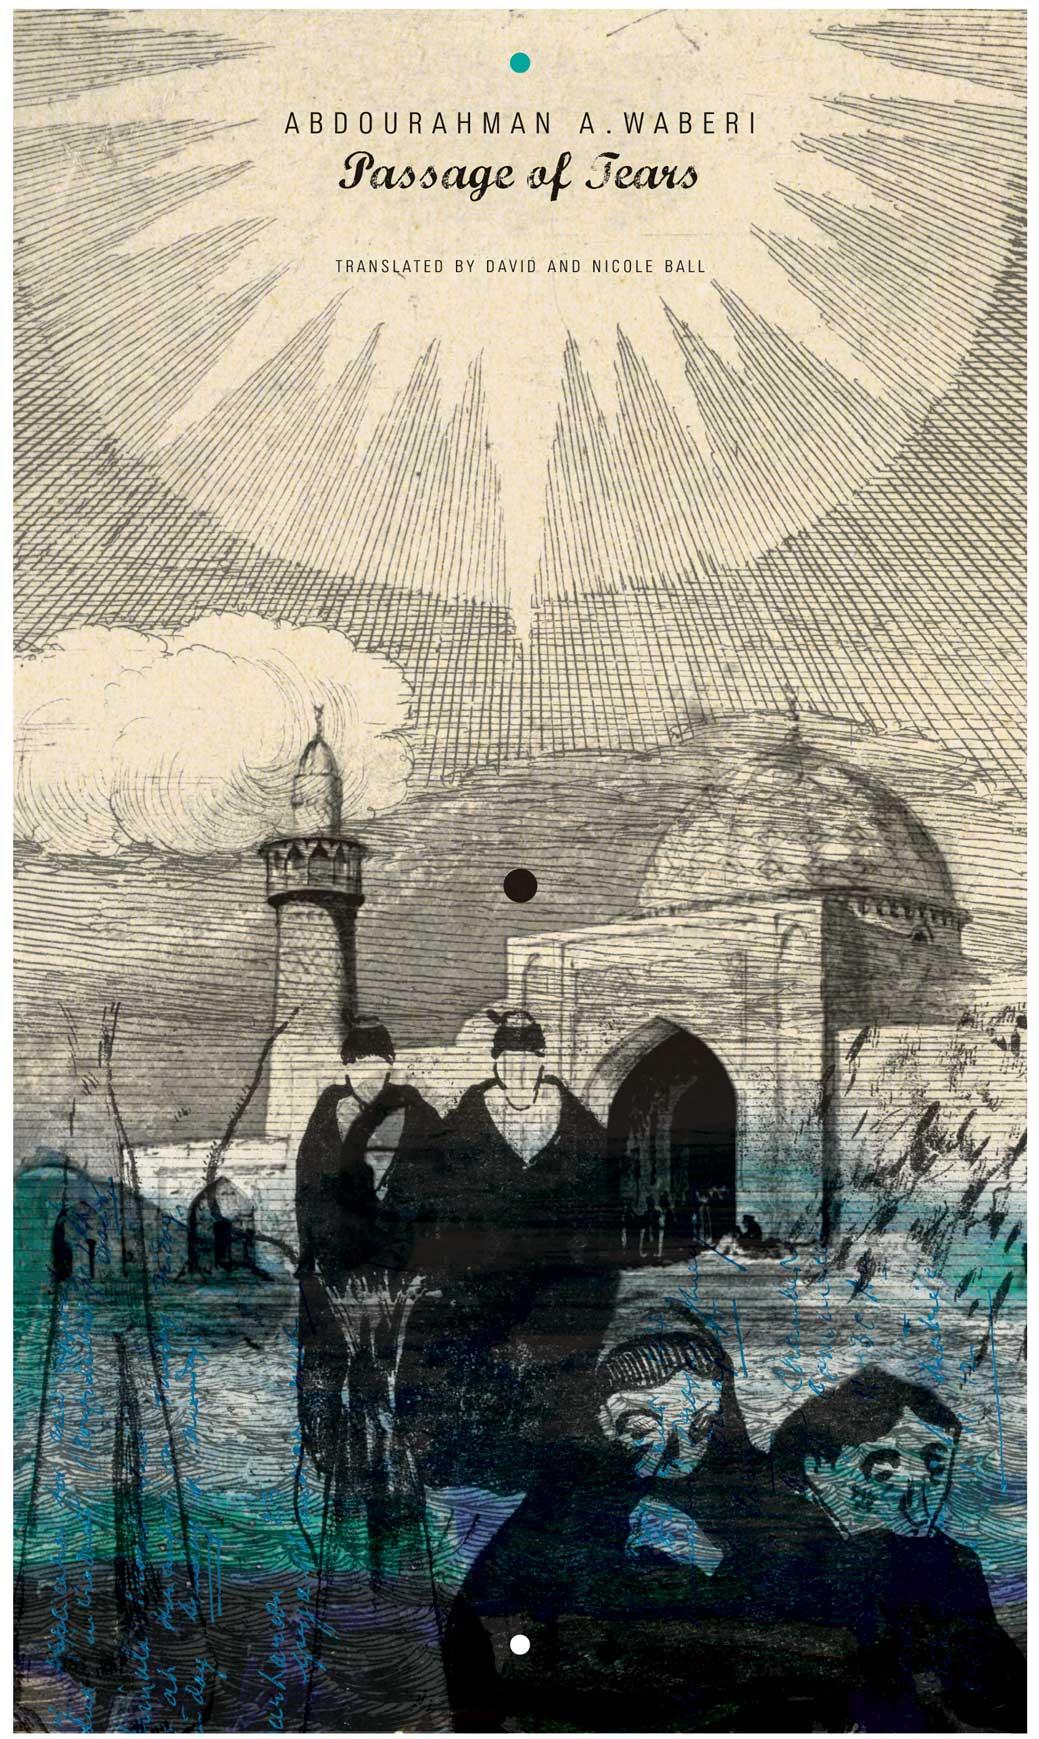 Passage of Tears by Abdourahman A. Waberi | Seagull Books